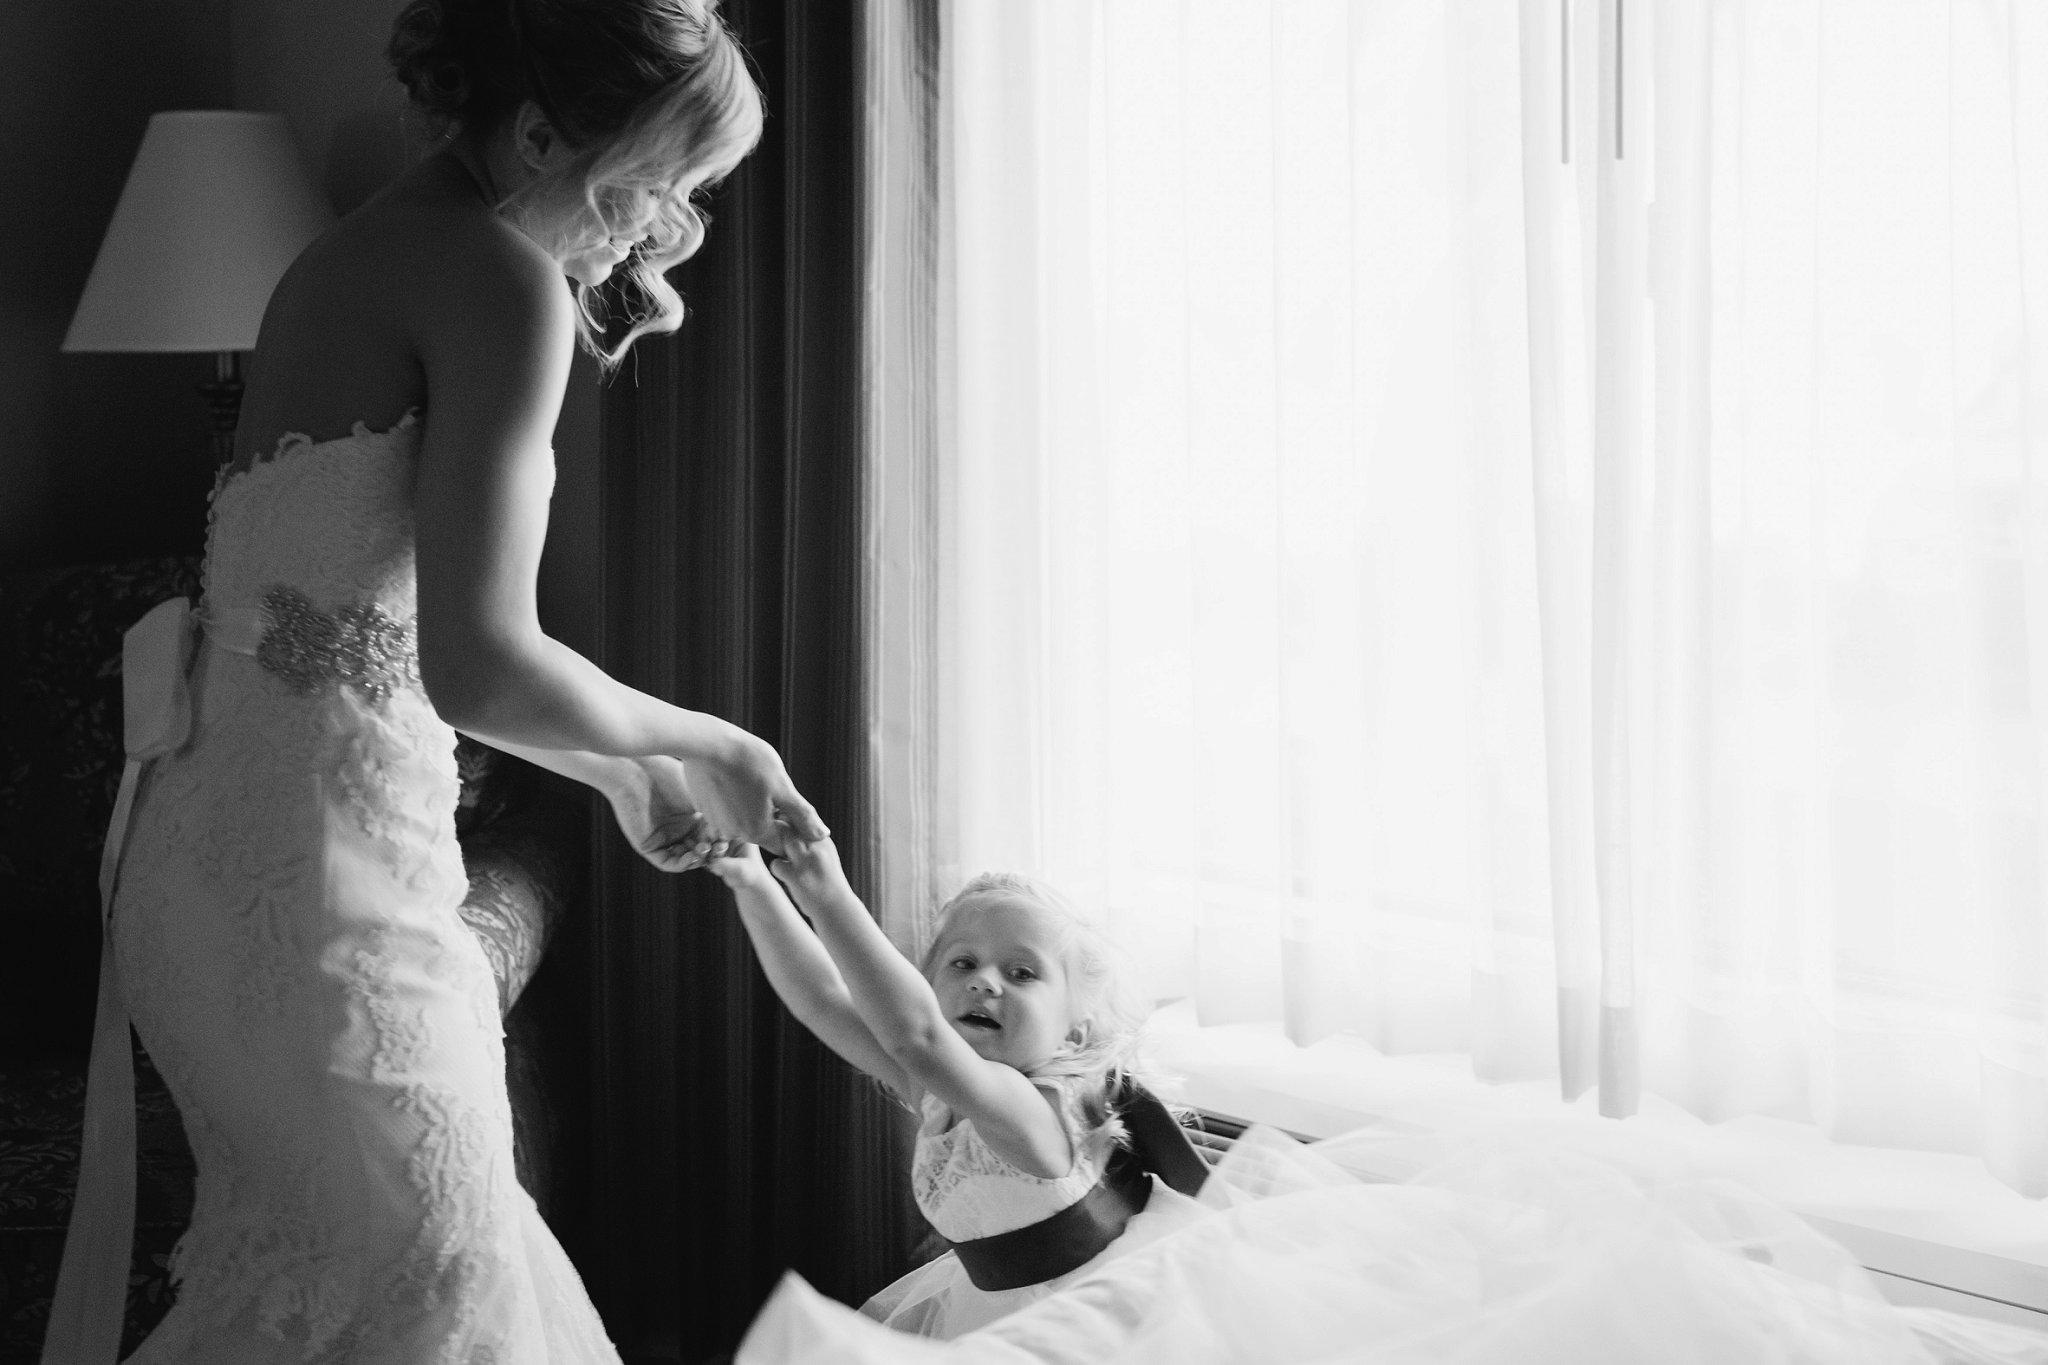 Mesa candid documentary wedding photographer